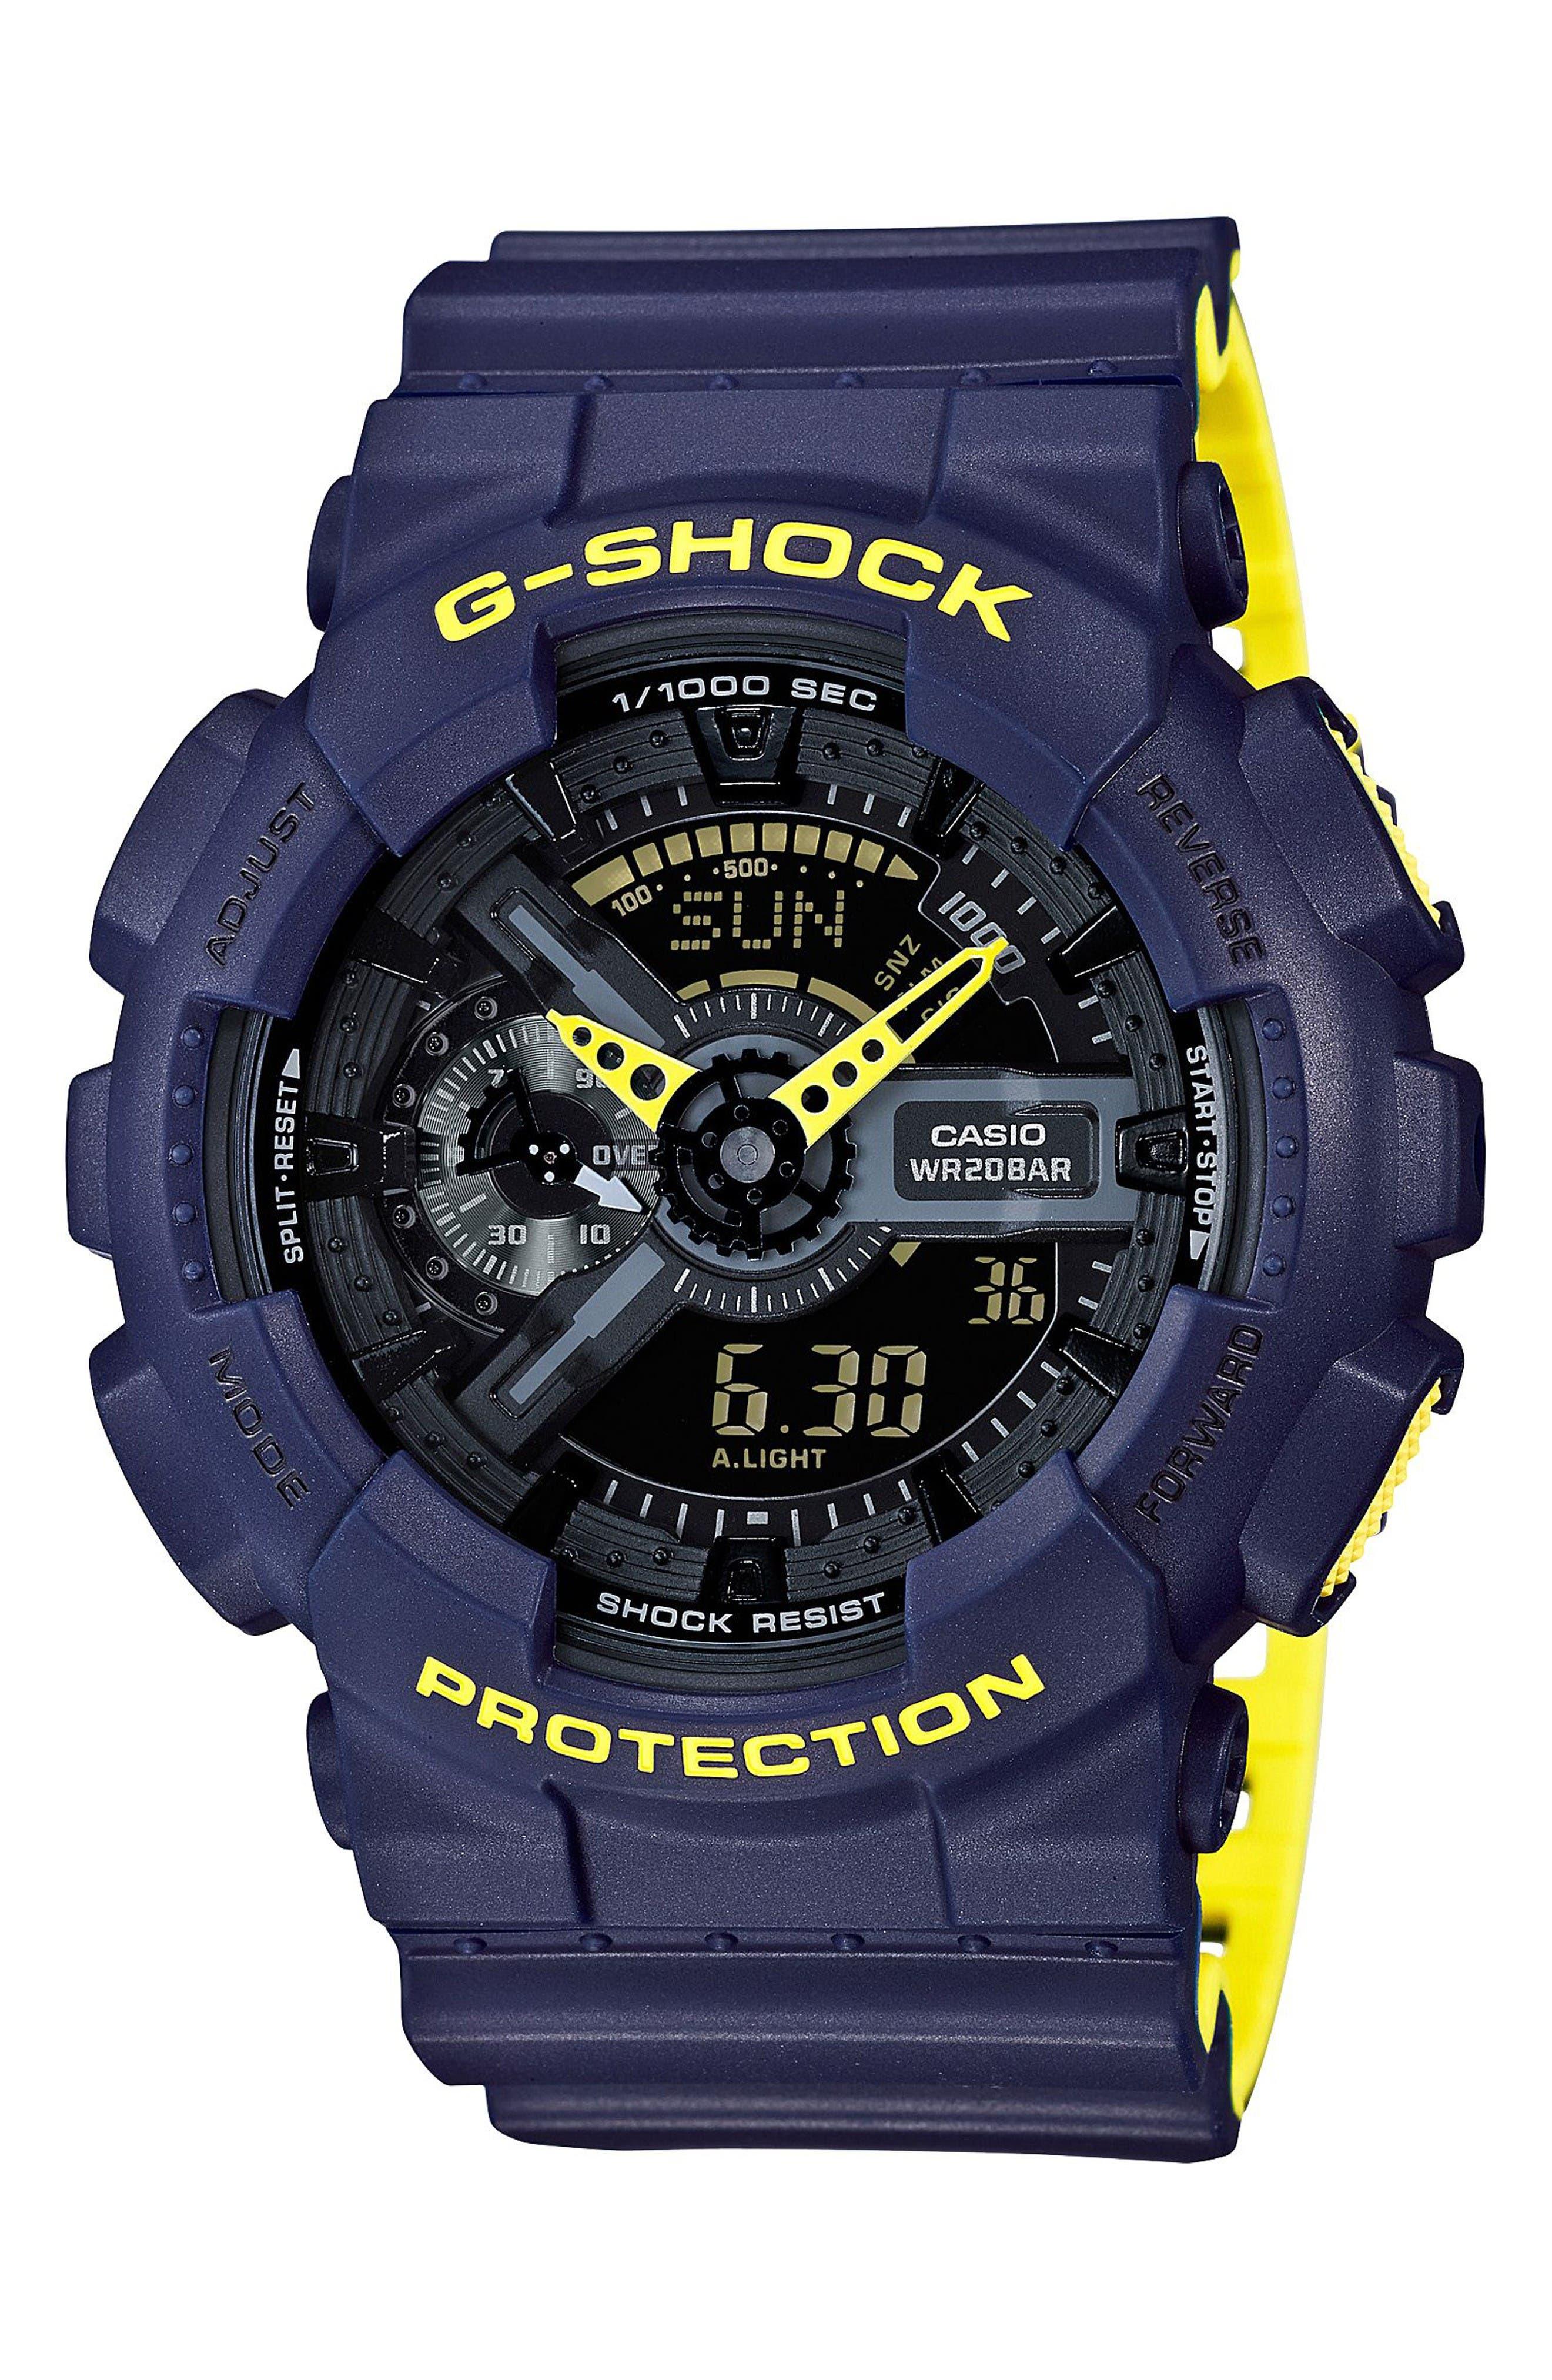 G-SHOCK BABY-G G-Shock GS Ana-Digi Layer Watch, 55mm